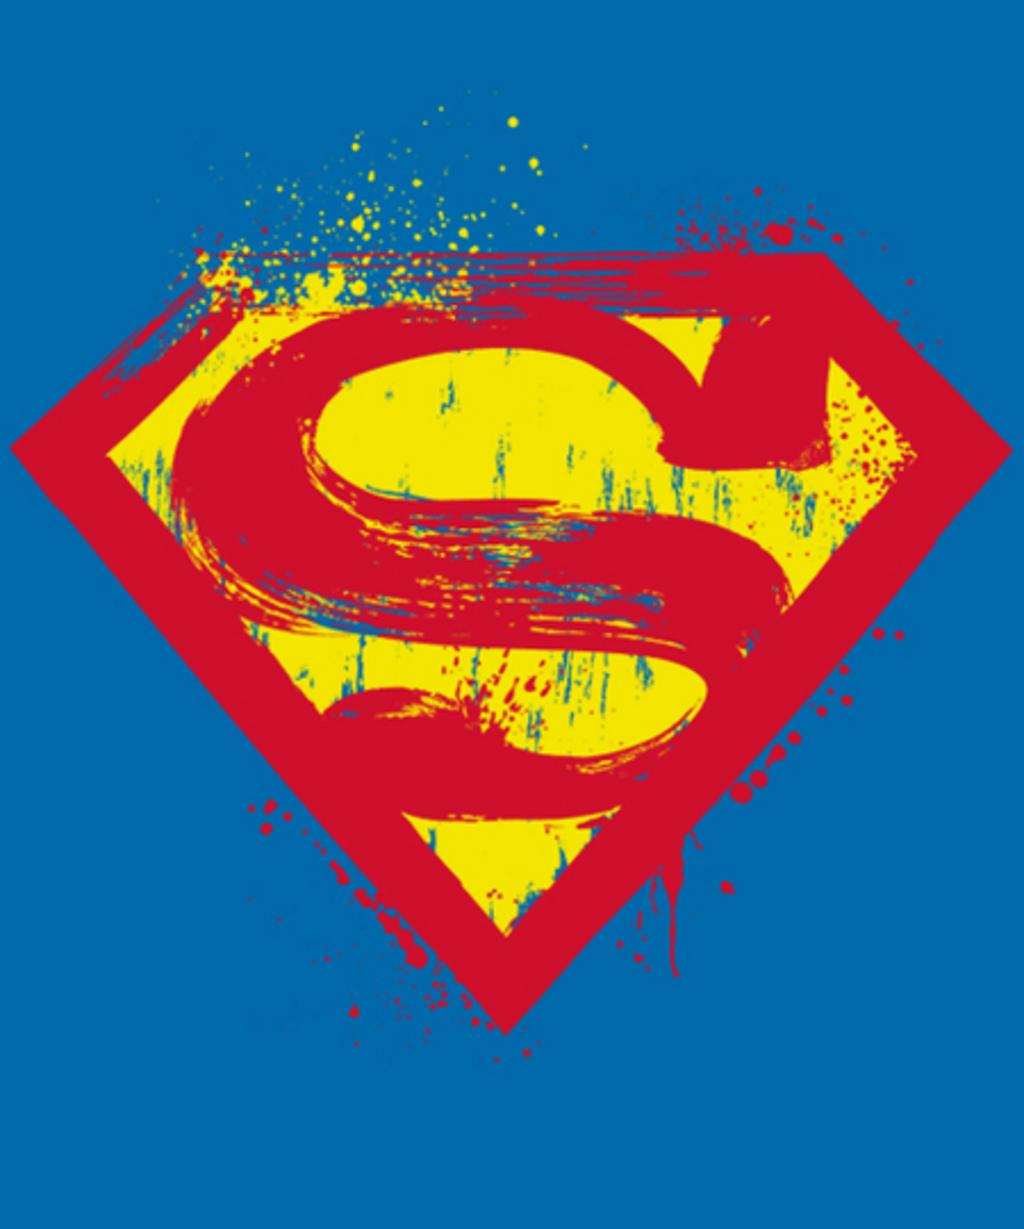 Qwertee: I am Super